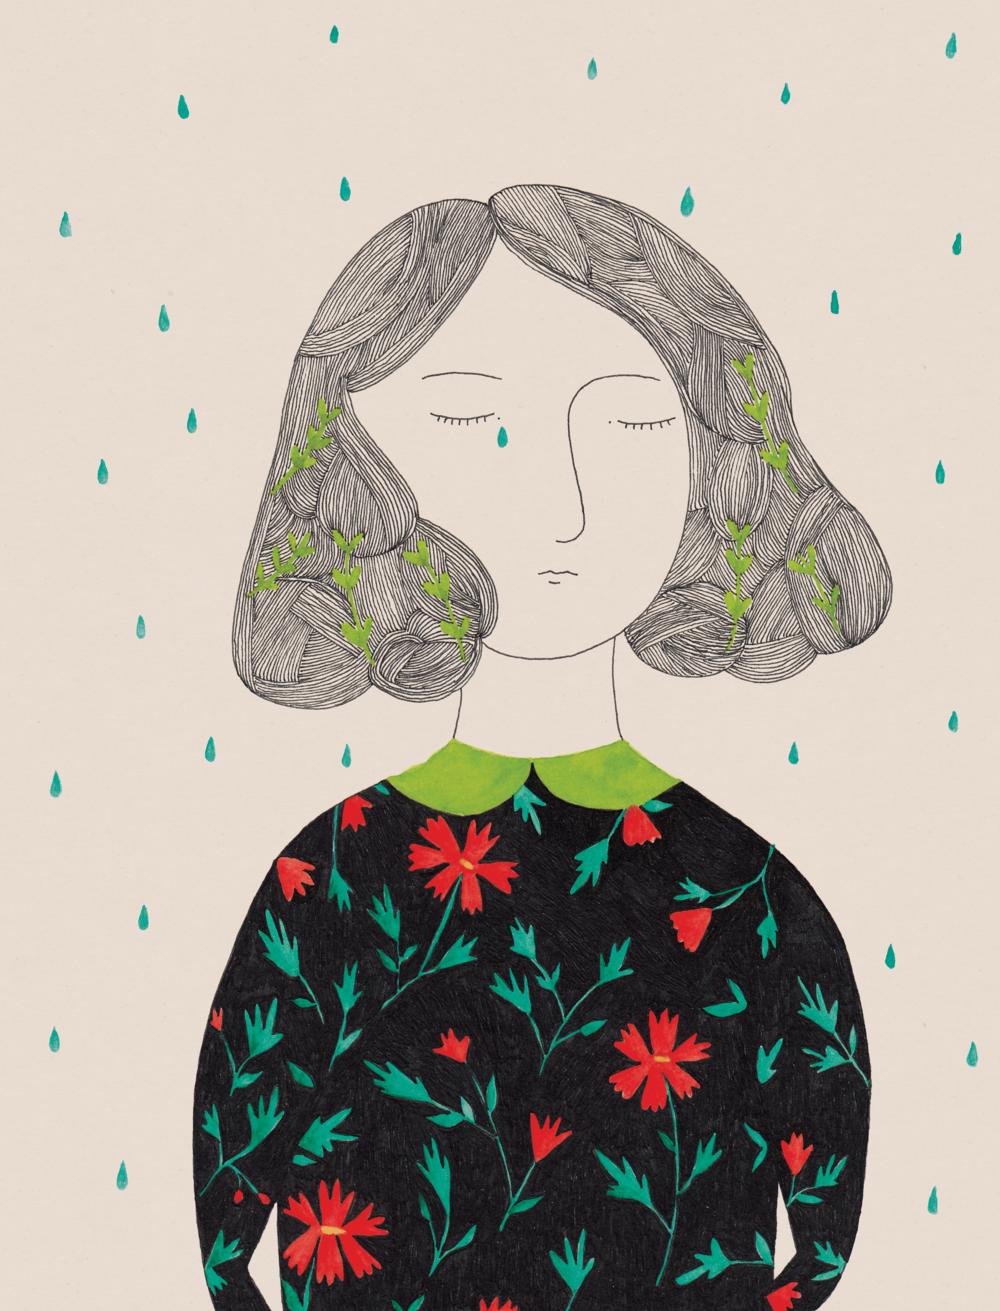 azorín - -illustration-